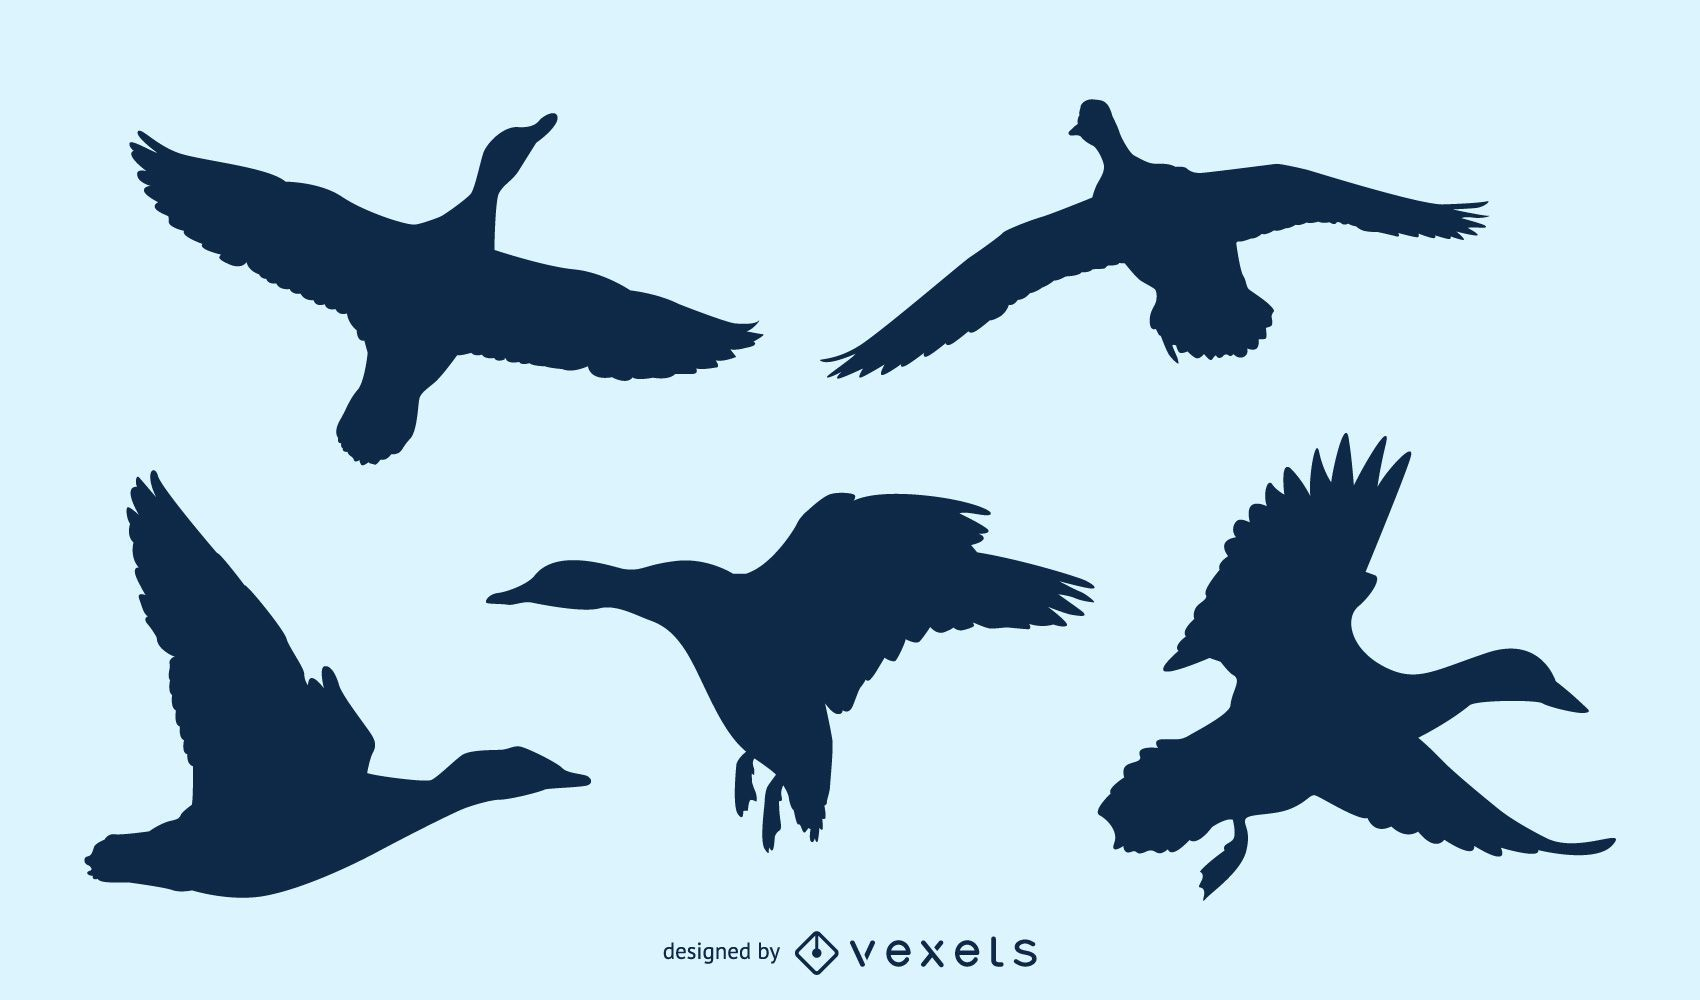 Duck flying silhouette set